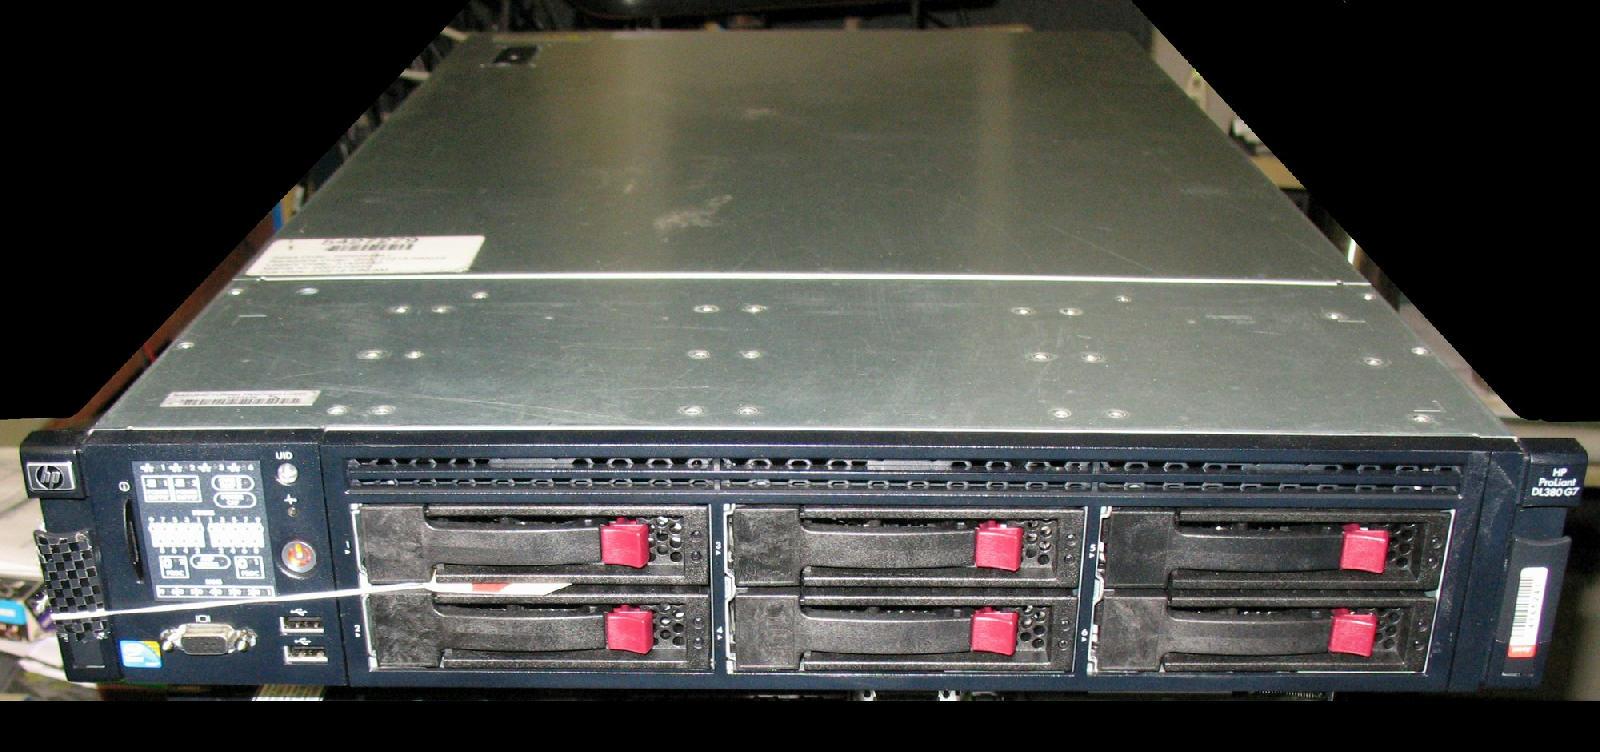 HP ProLiant DL380 G7 Server 2xSix-Core Xeon 2 93GHz + 96GB RAM + 6x2TB SAS  RAID